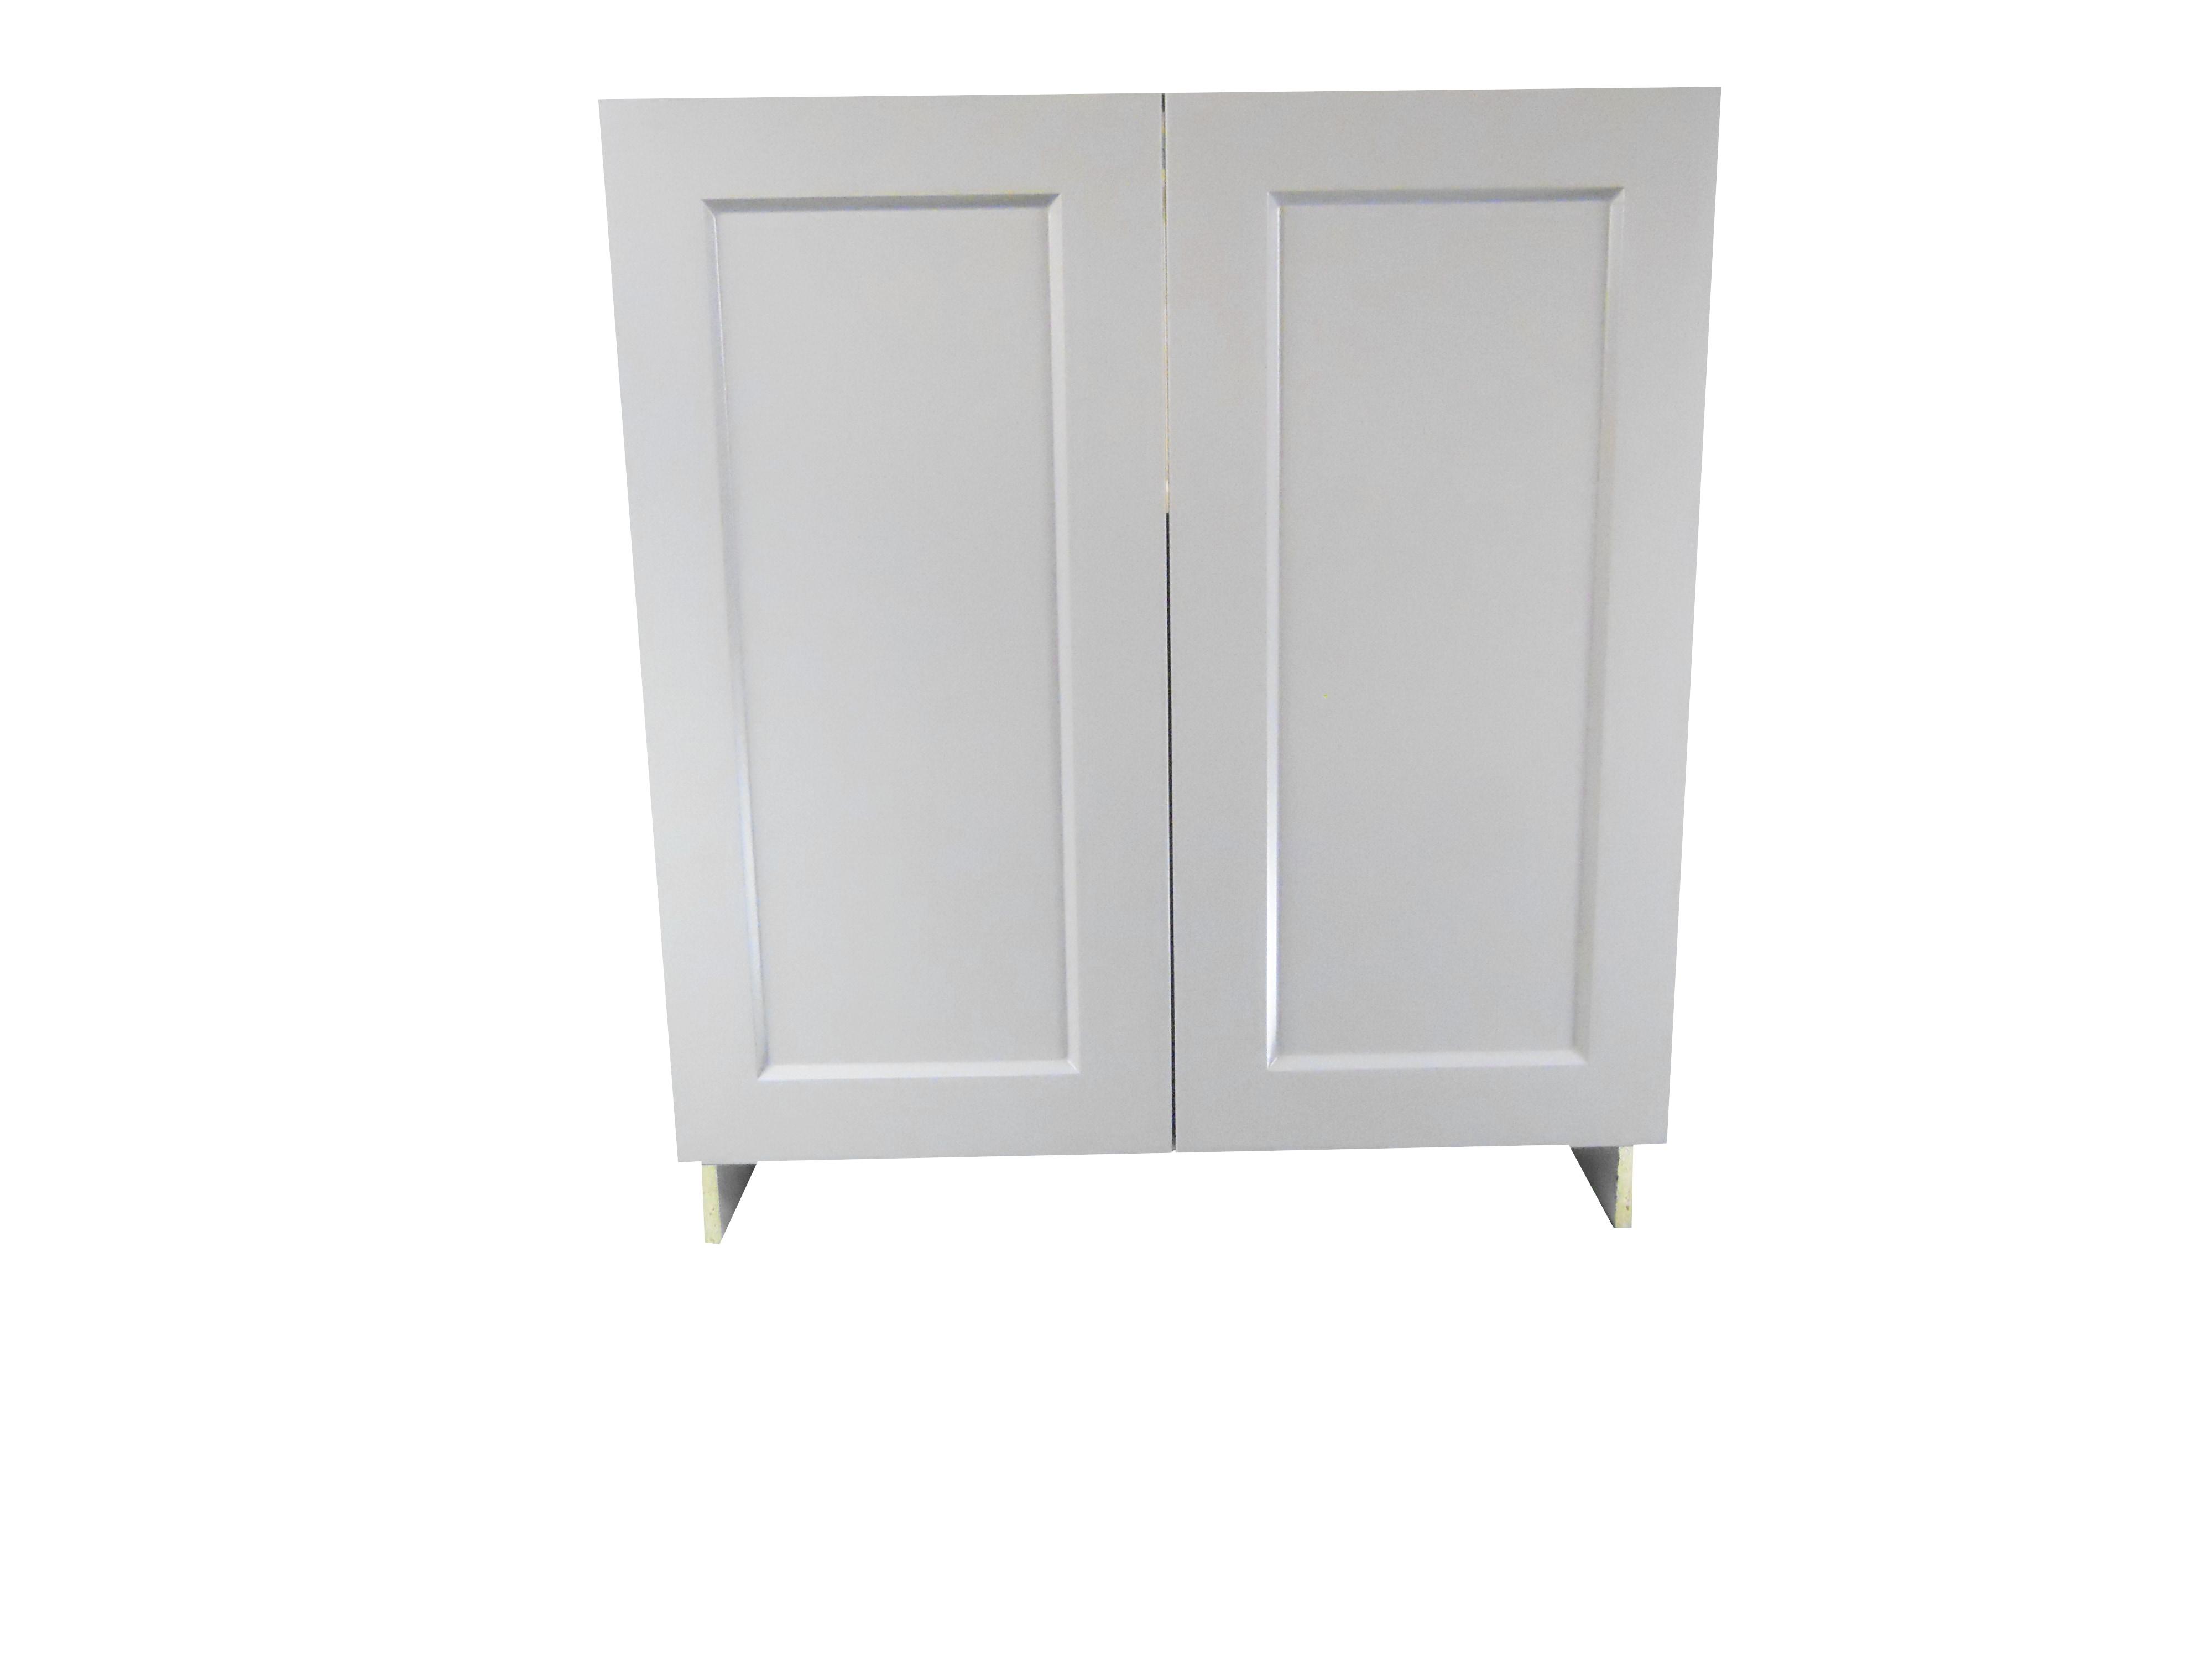 Base Cabinet With 2 Door / Whistler Grey / Flat Panel Grey / 36 Whistler Grey 0